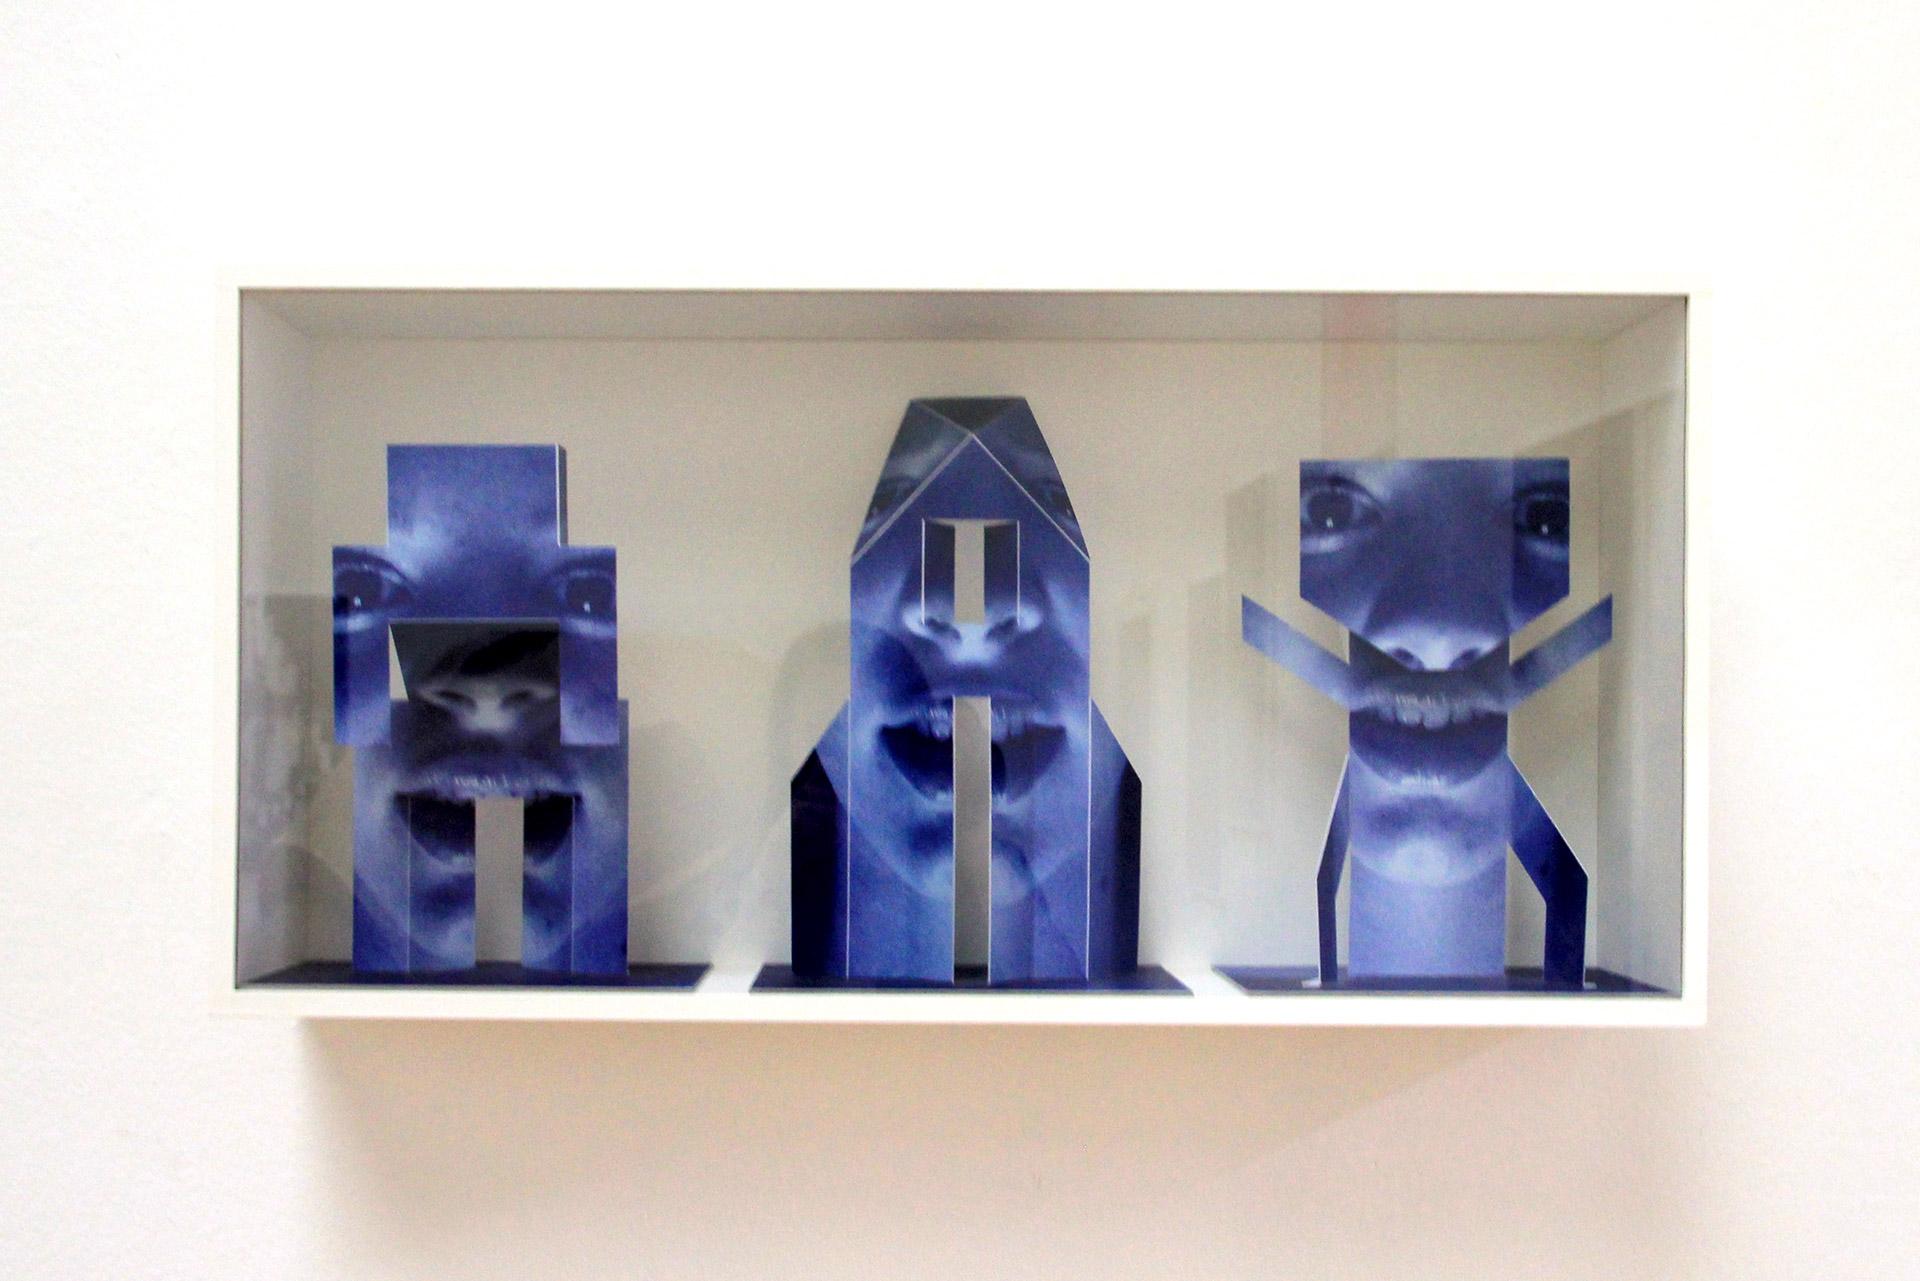 Dezember-Ausstellung-Kunsthalle-Winterthur-2013-1.jpg